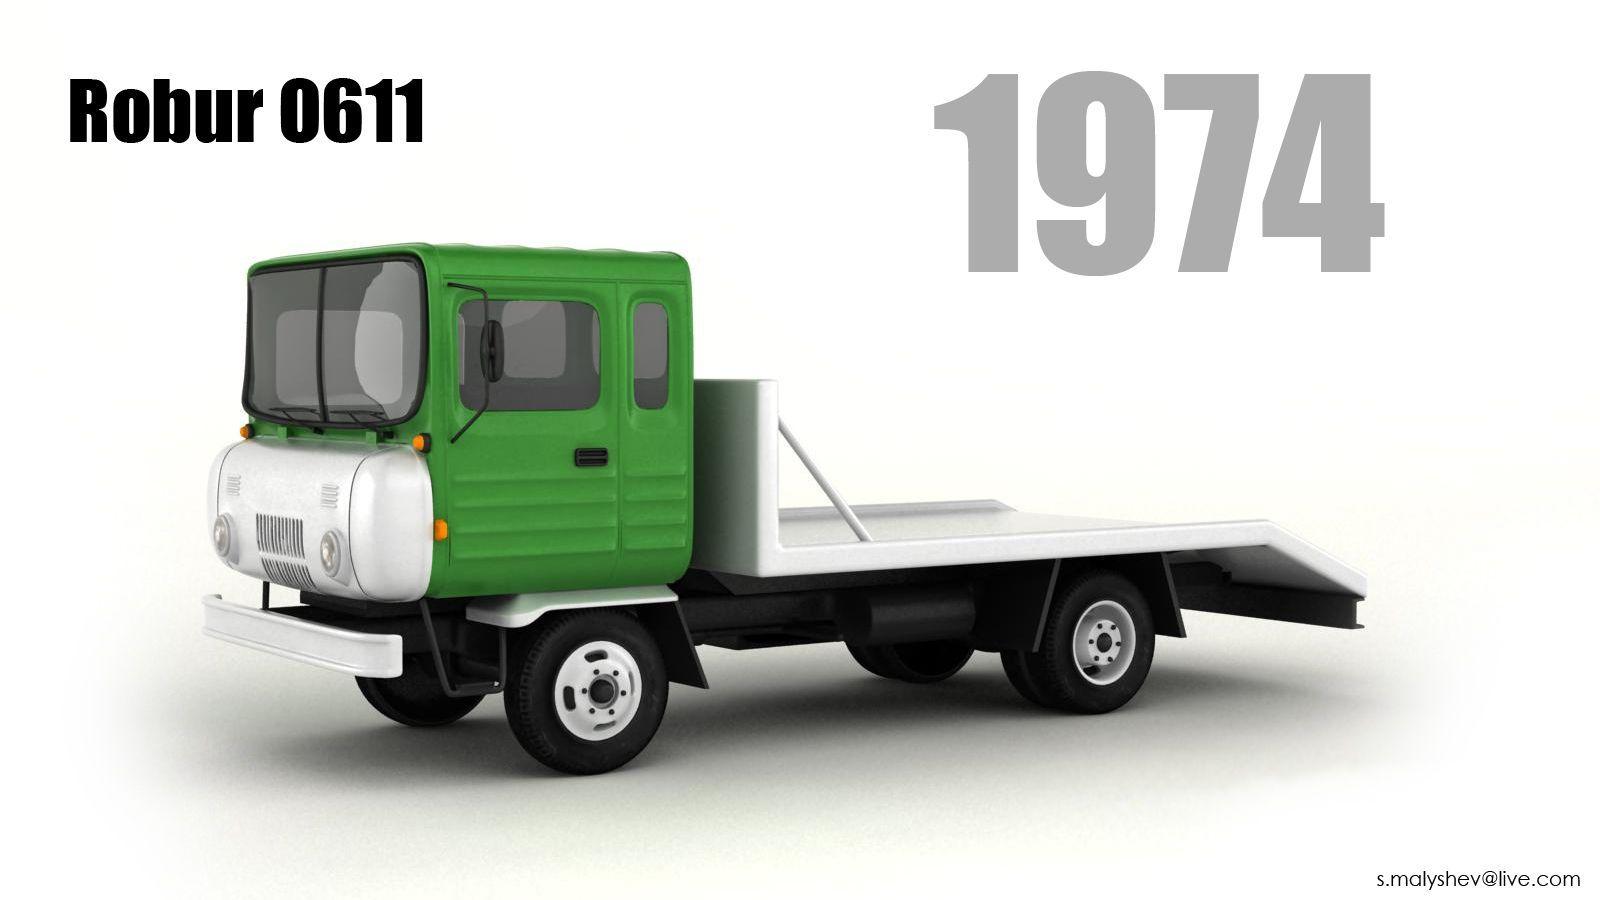 Robur O611 Ddr fahrzeuge, Ddr, Fahrzeuge